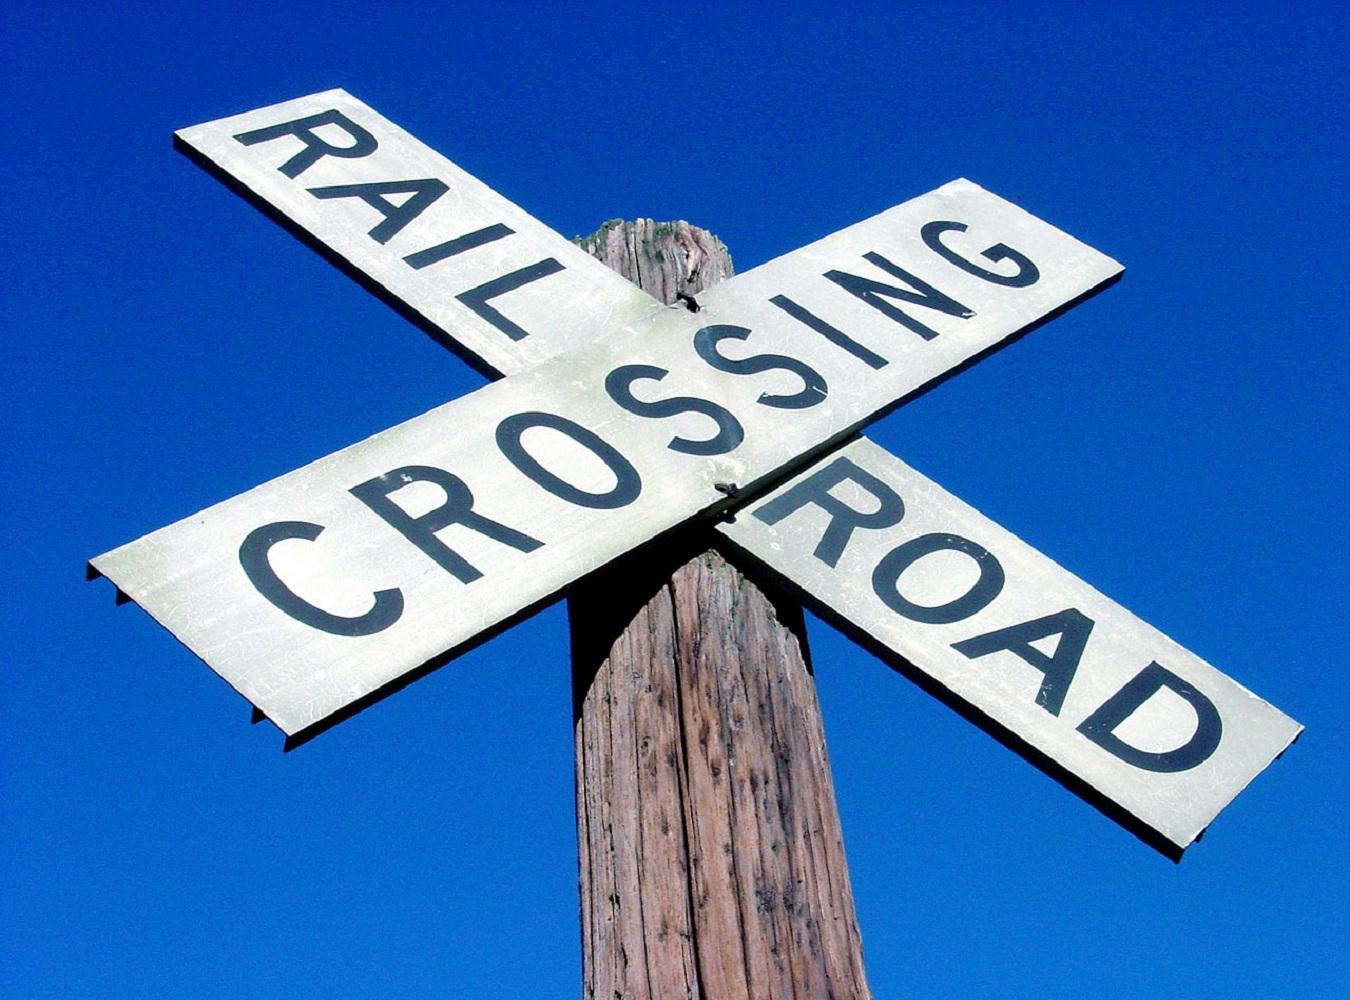 RAILROAD CROSSING_1494357839106.jpg